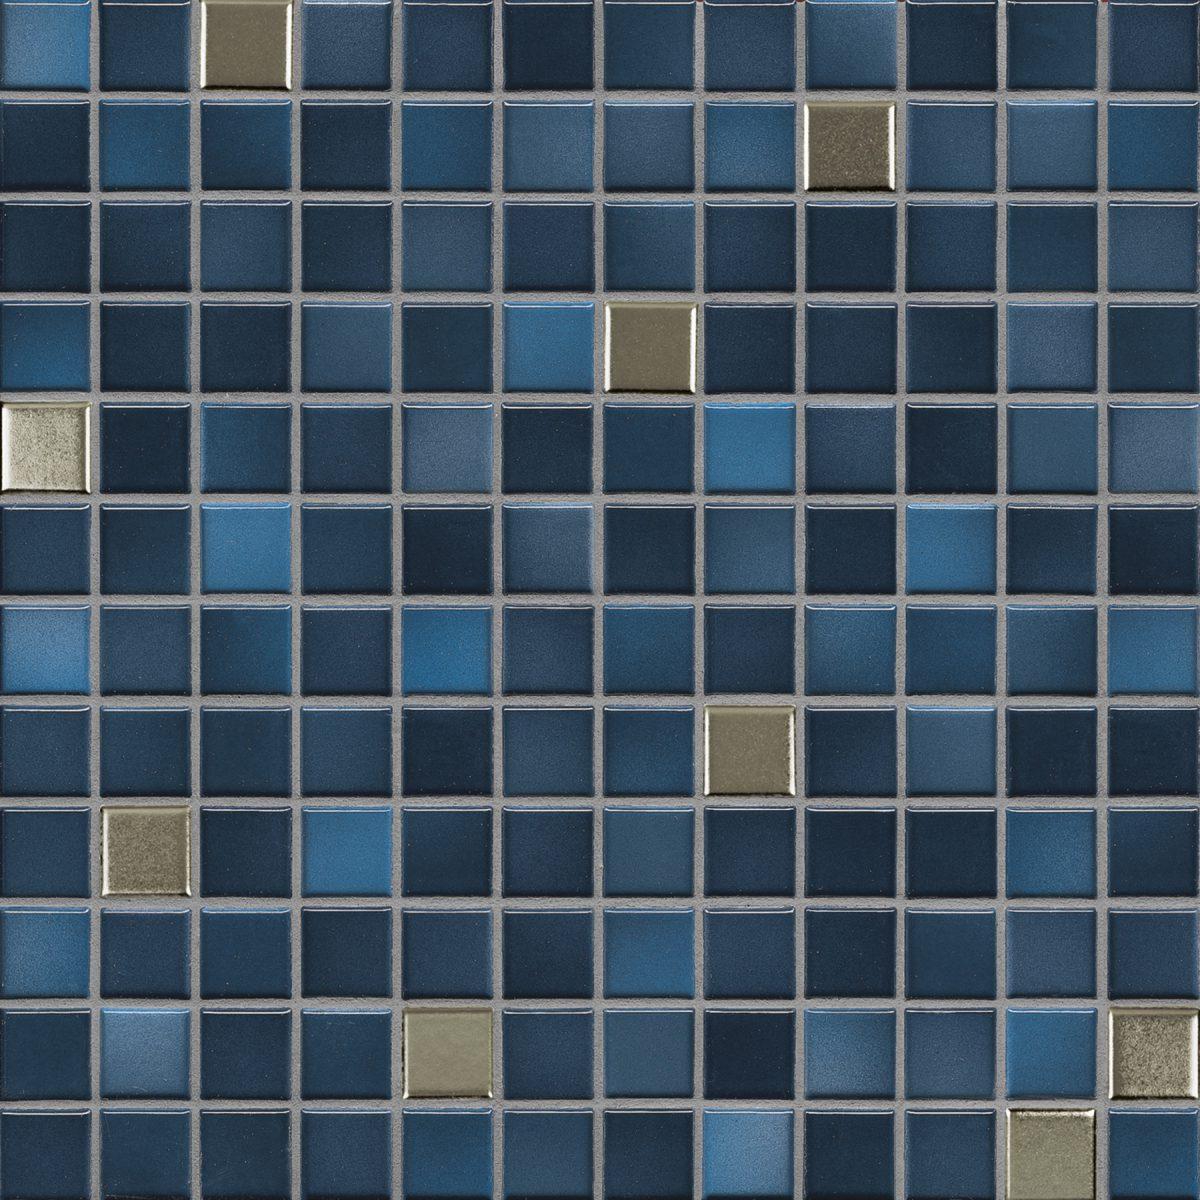 Мозаика серия Fresh 2,4 X 2,4 см Midnight Blue Mix Metal Glossy (глазурованная)